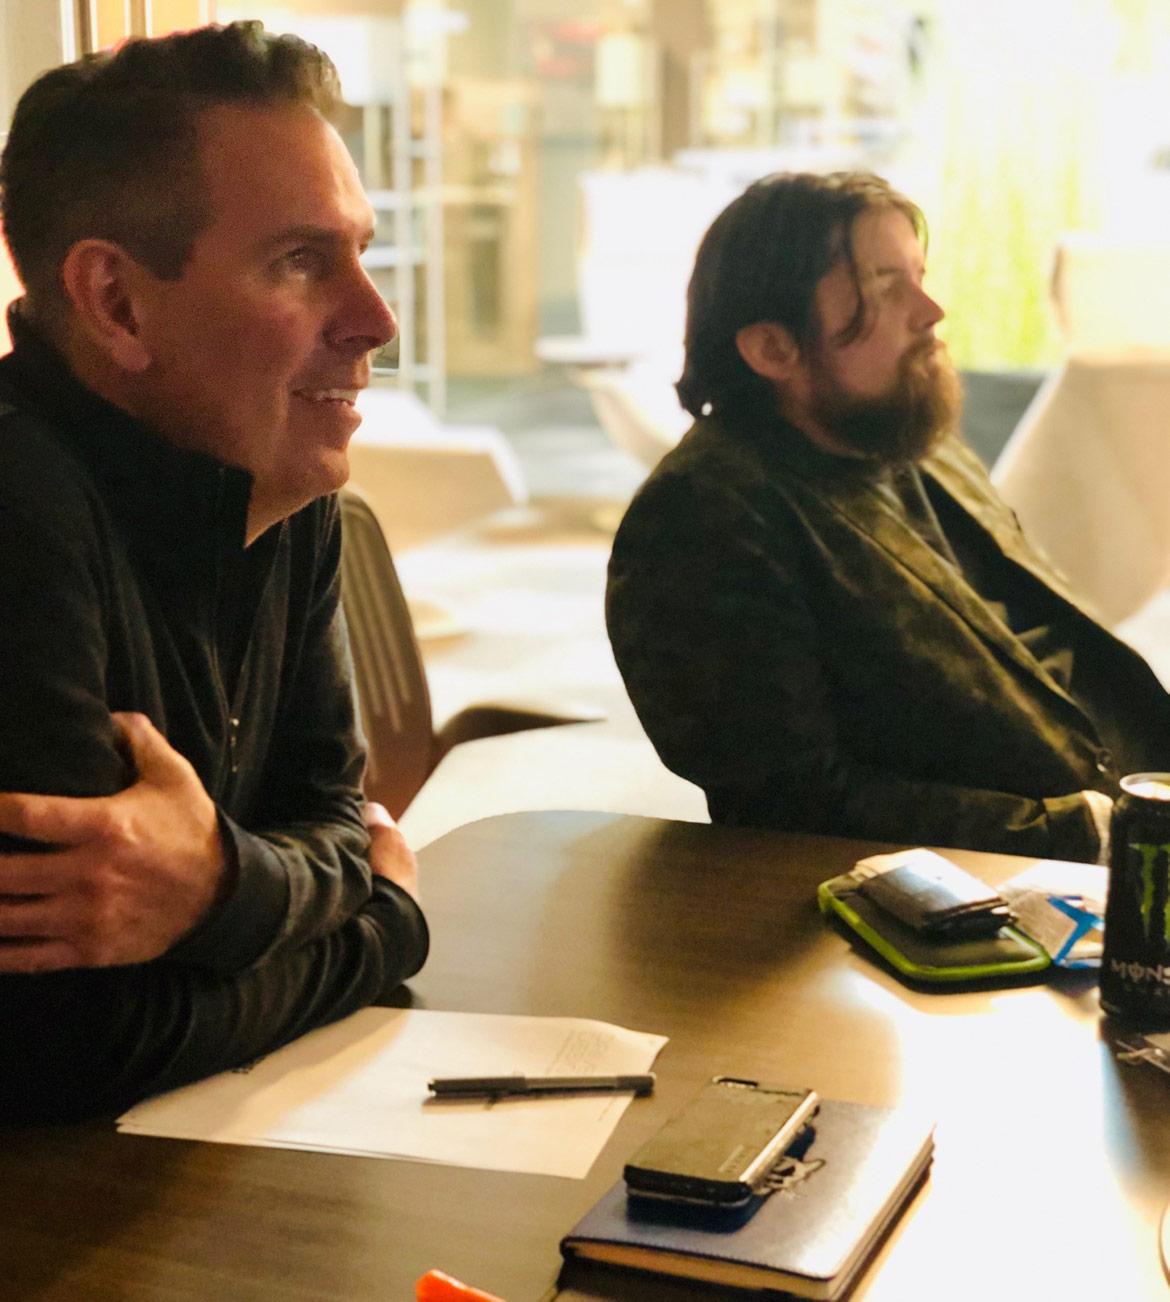 Two men watching presentations